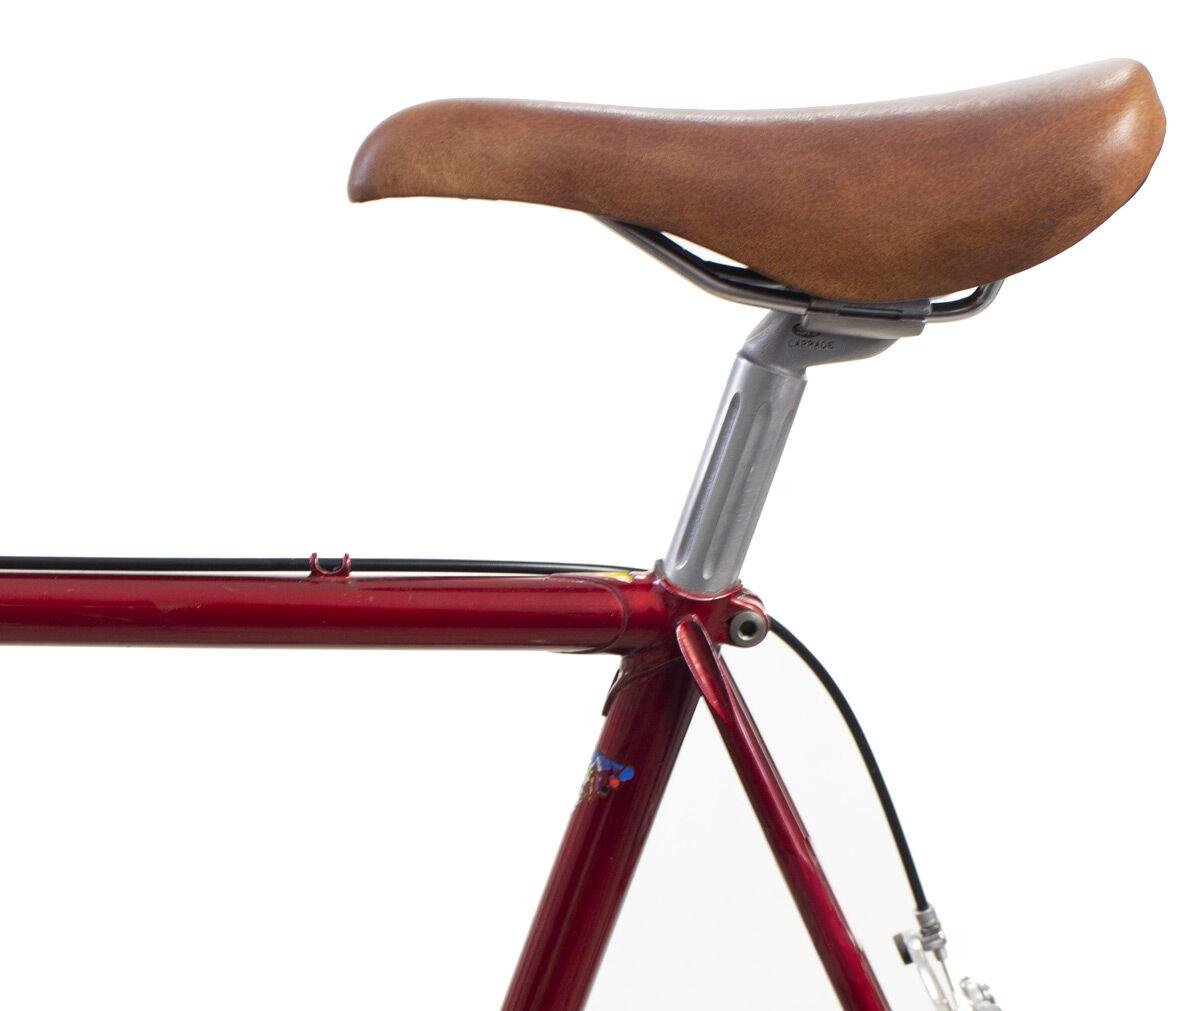 Outlet Fahrradsattel kleinere Lederfehler - fehlerhaftes Design -- ansonsten neu - siehe Video